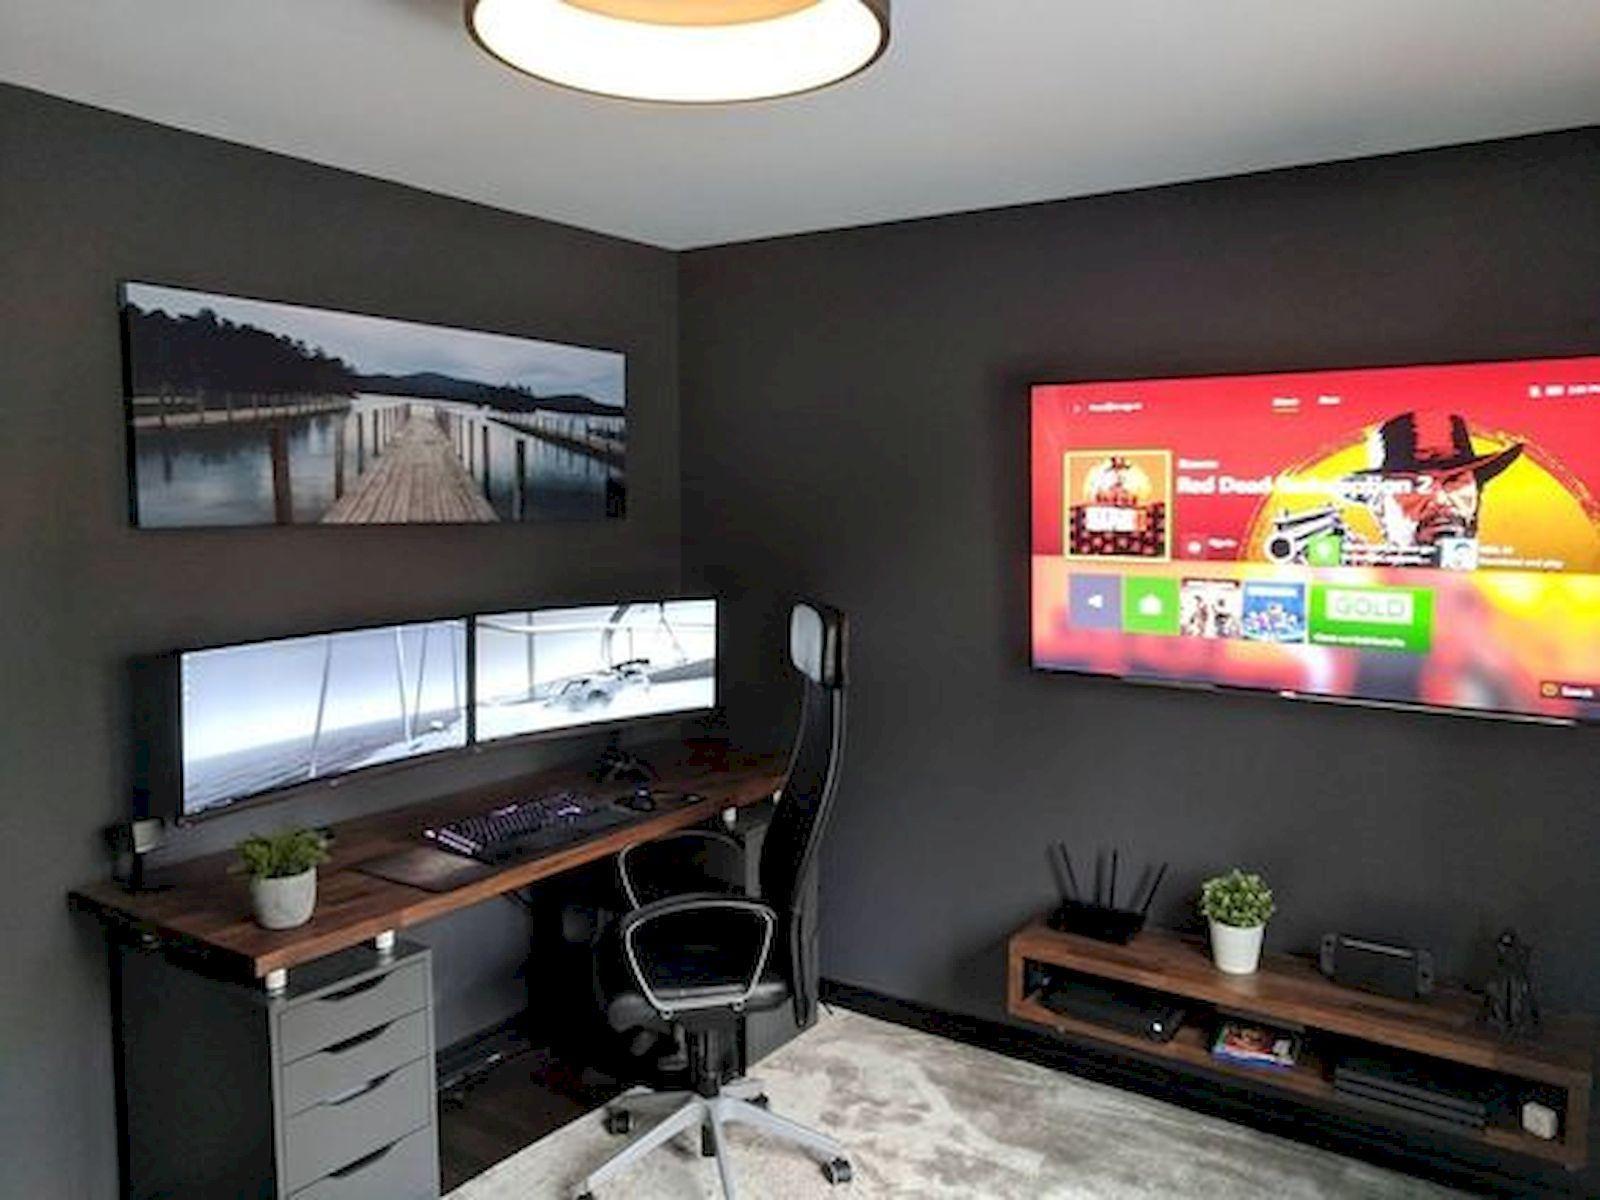 22 Diy Computer Desk Ideas That Make More Spirit Work Enthusiasthome Bedroom Setup Home Office Setup Home Office Design